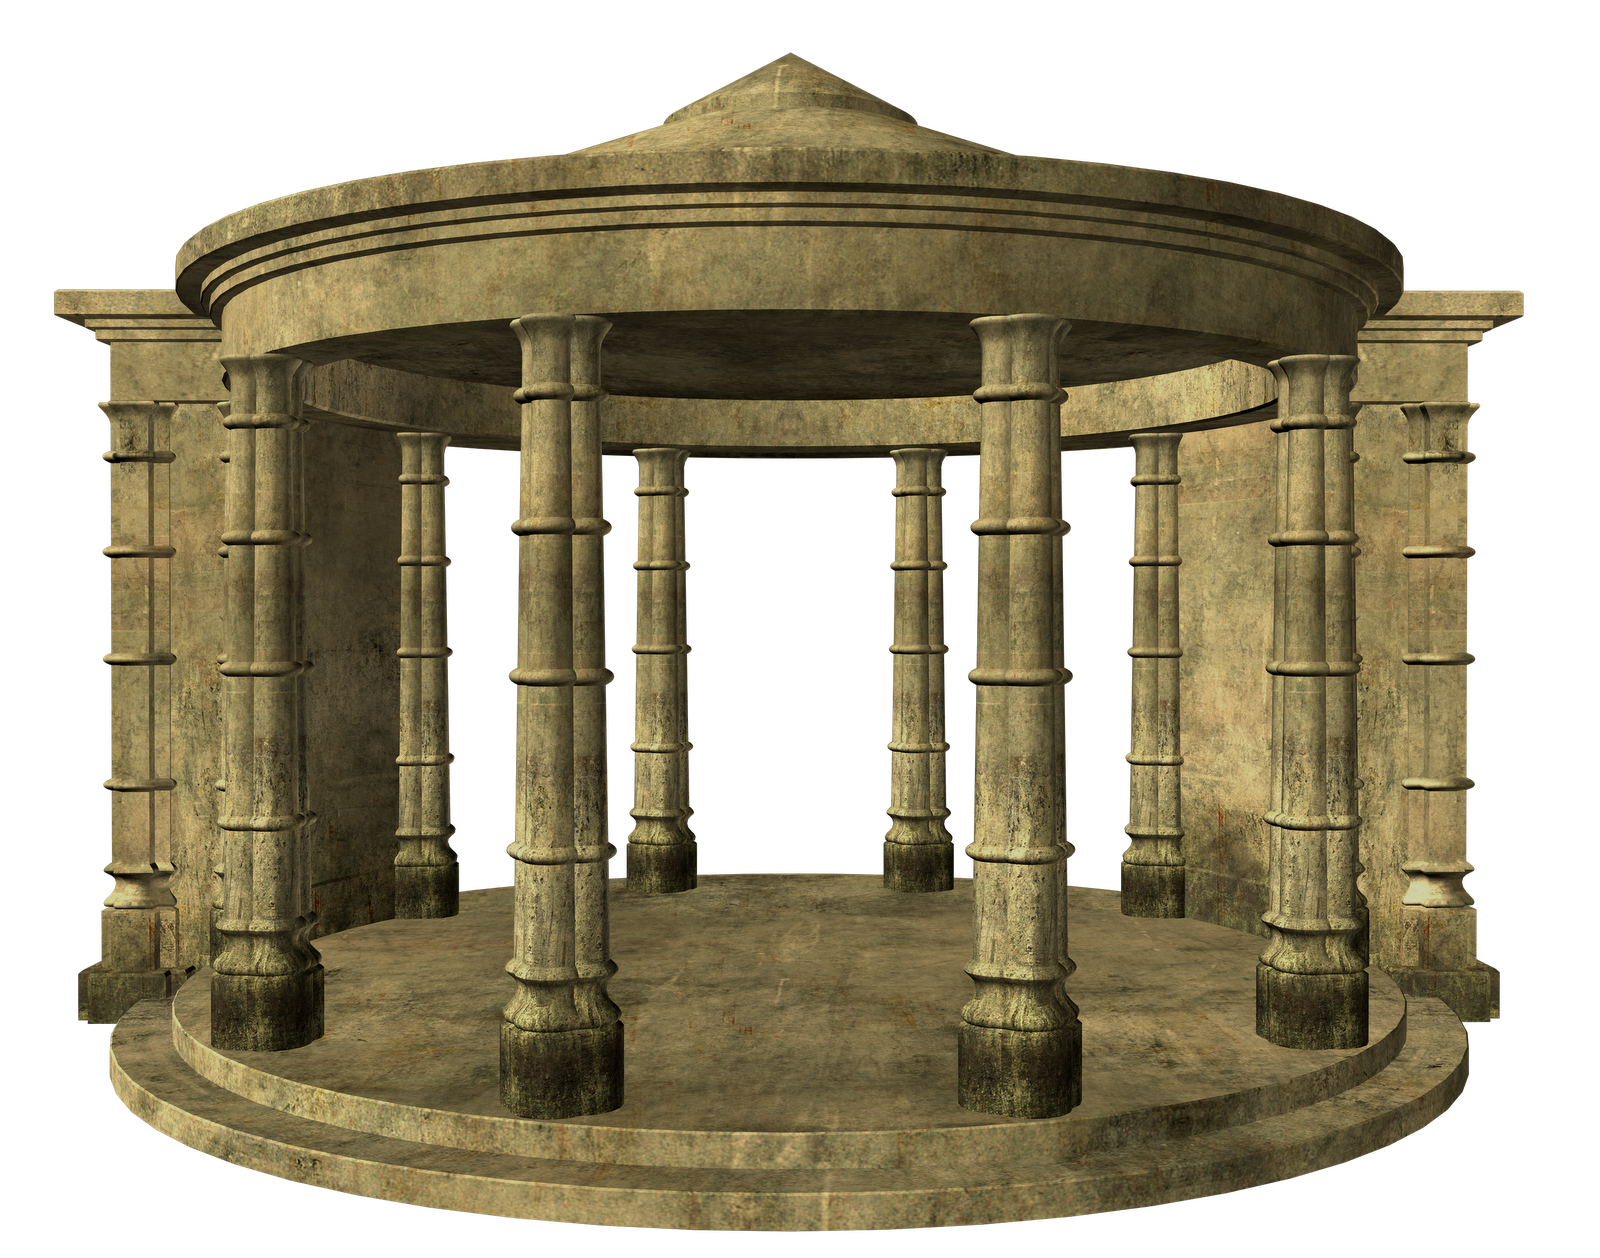 Colosseum ruins architecture clip. Column clipart old temple